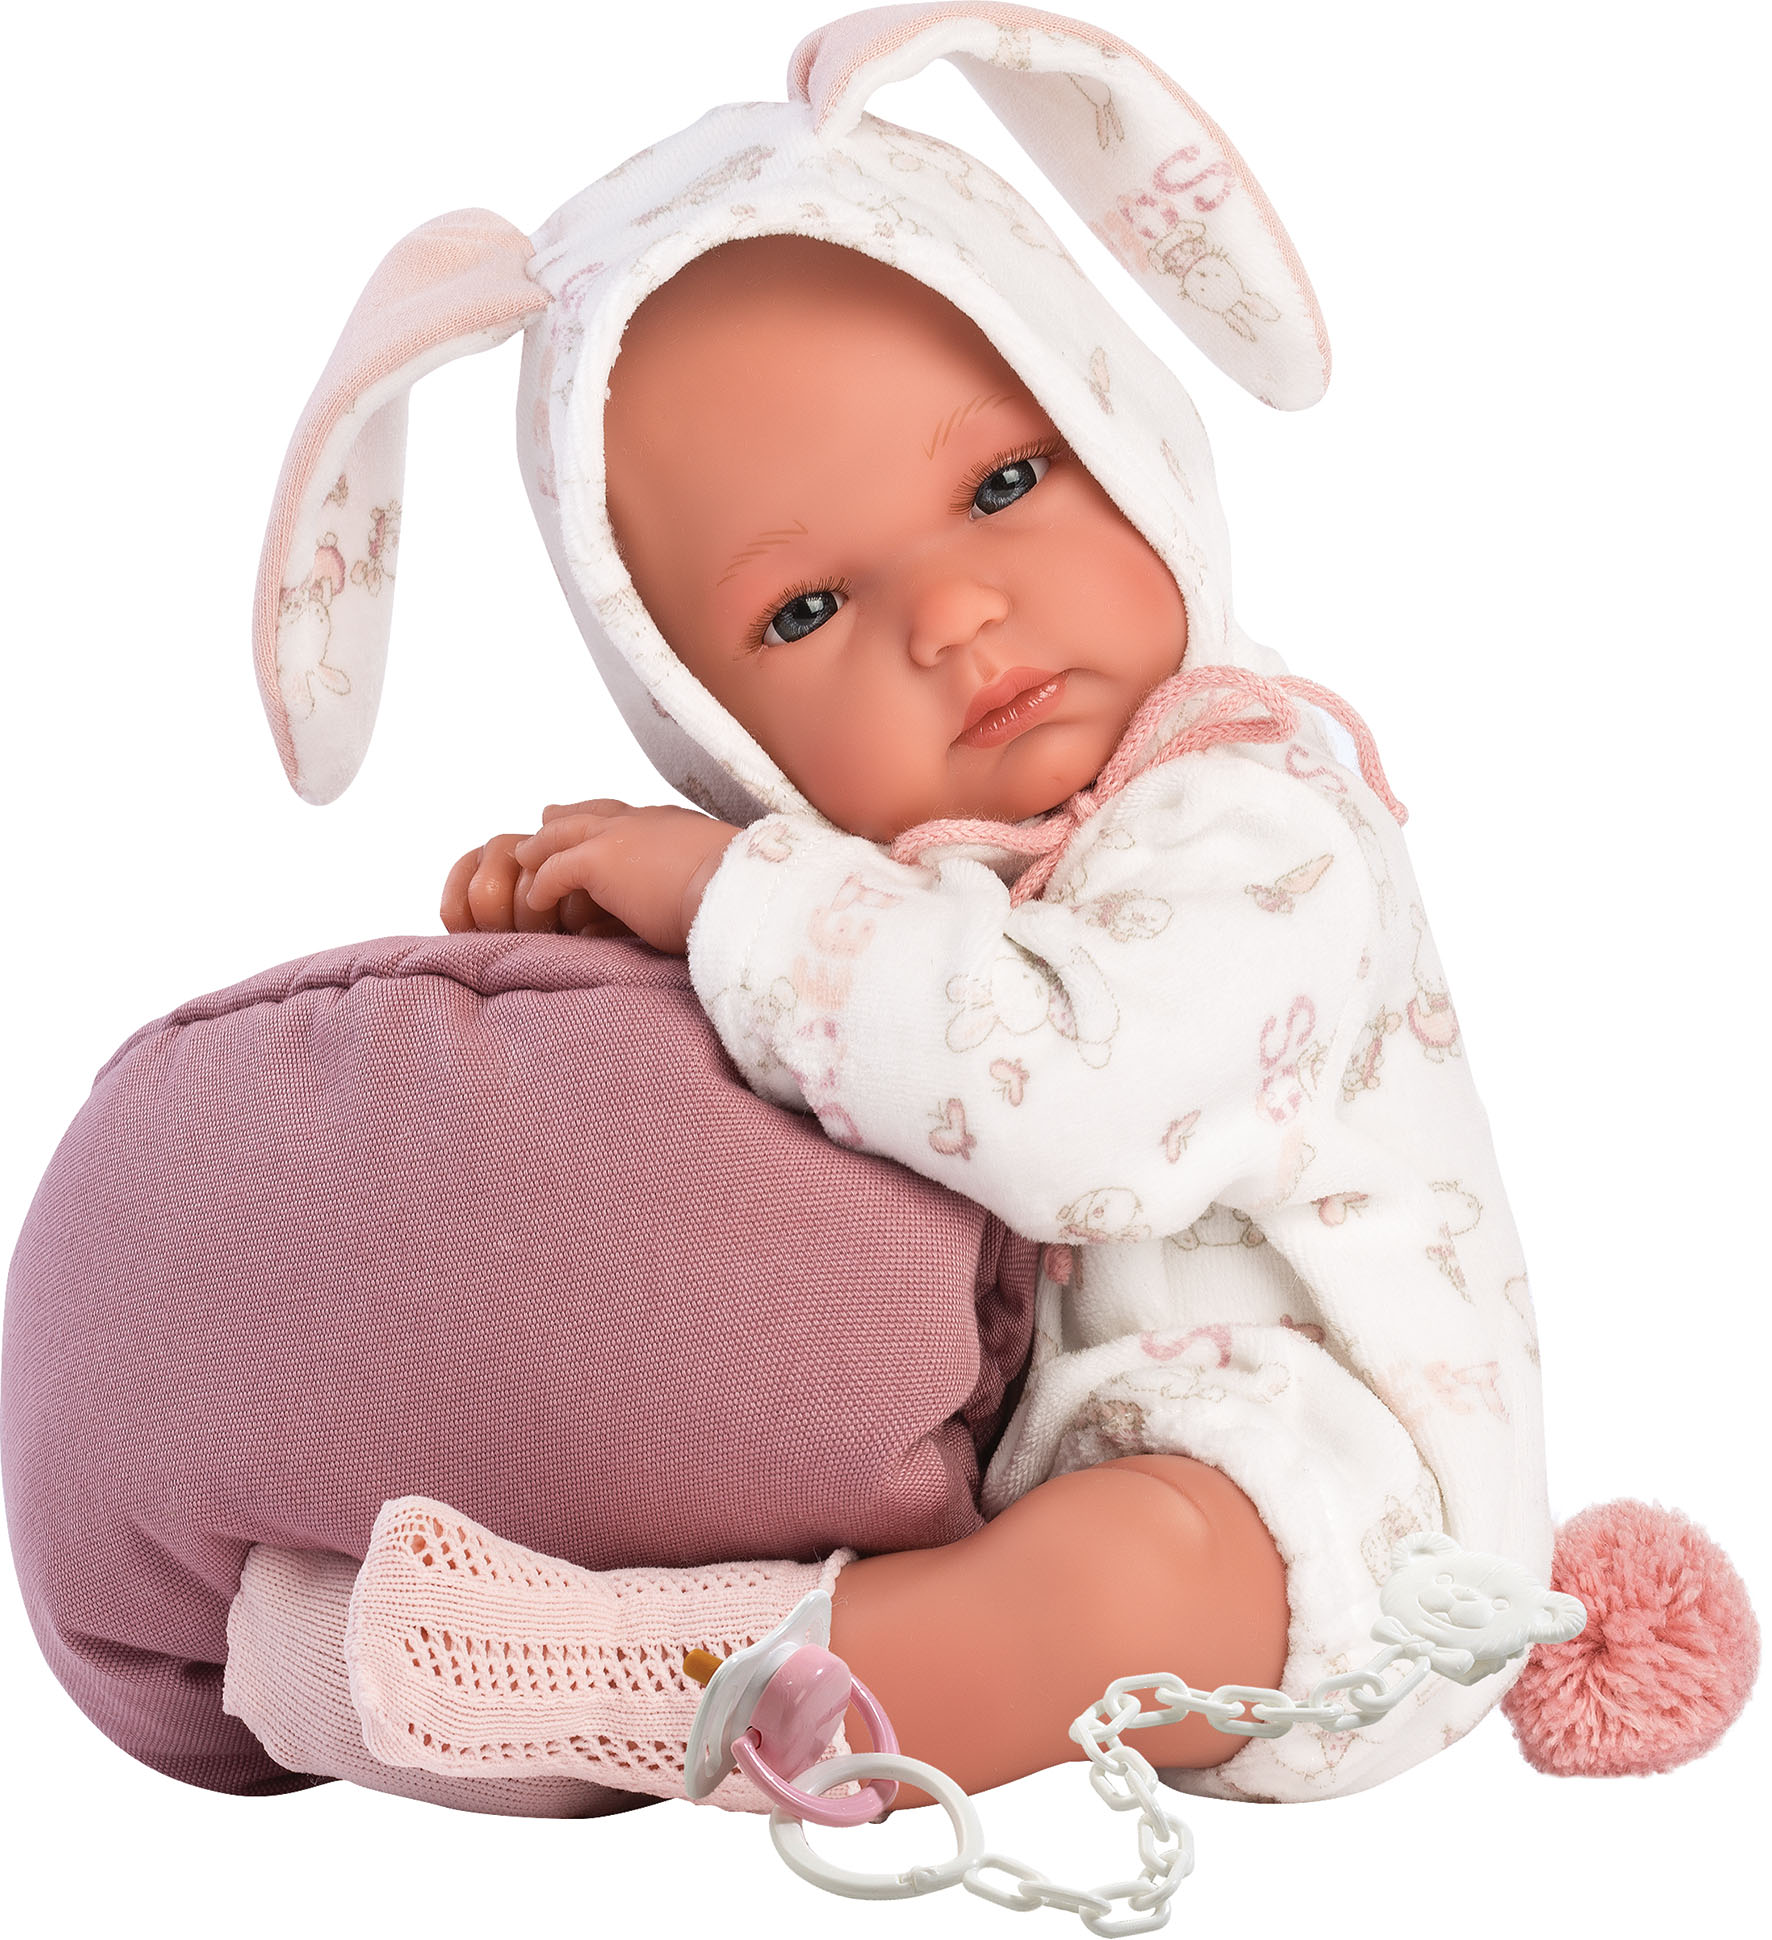 bambola-coniglio-c-borsa-35-cm